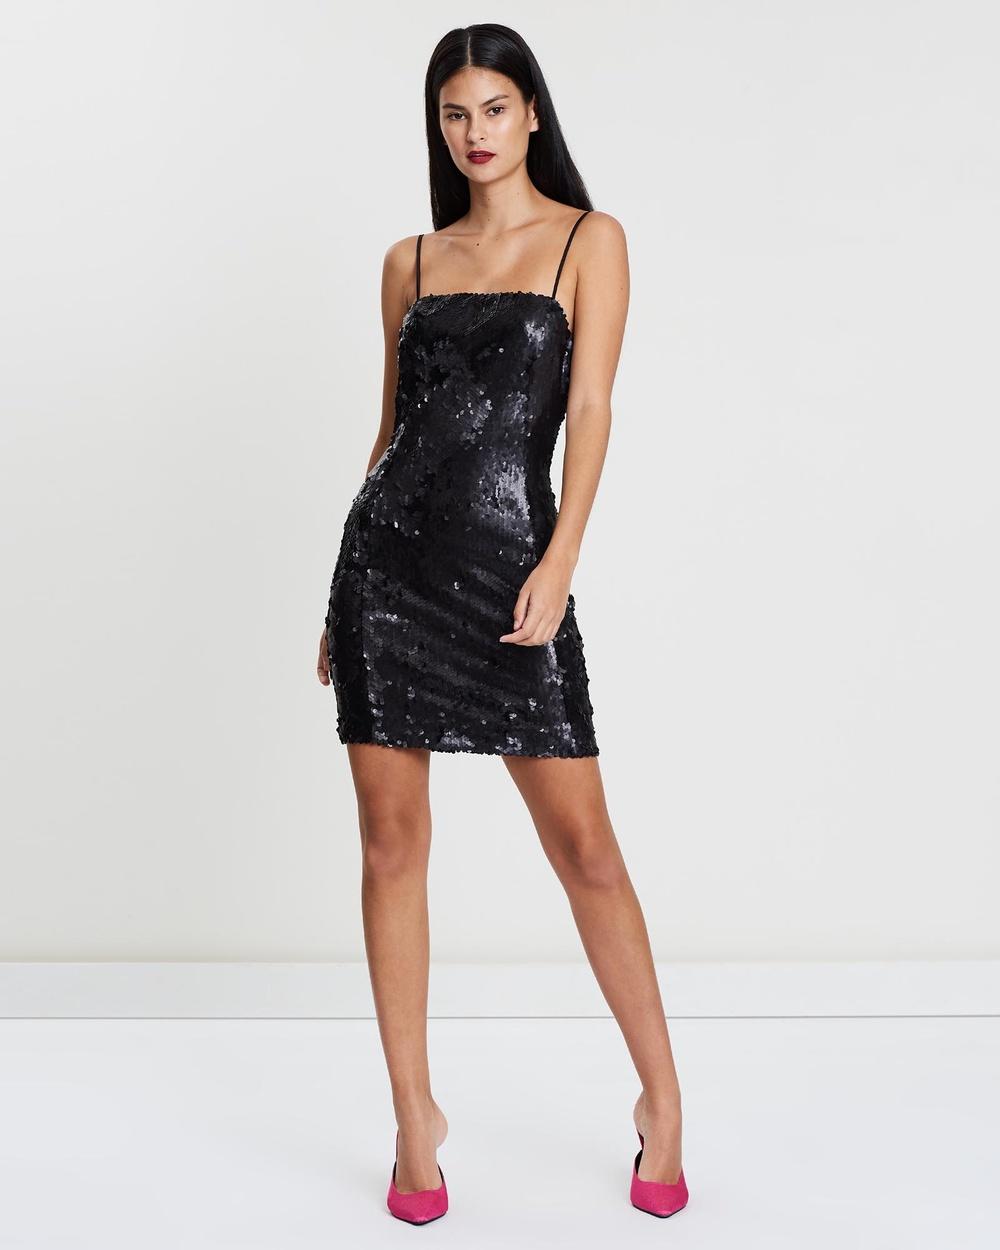 SANTINA-NICOLE - Sequin Mini Dress Dresses (Black)